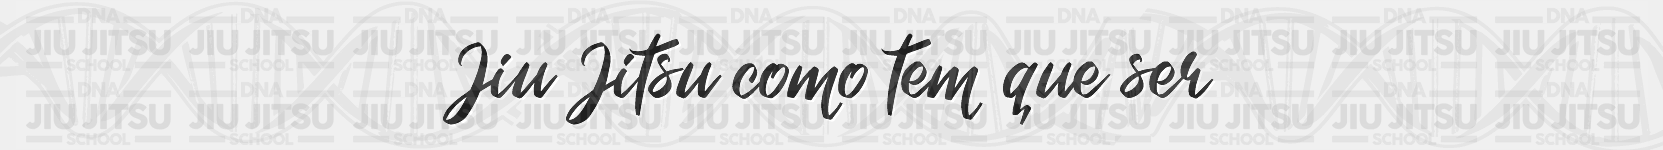 DNA Jiu-Jitsu School Curitiba